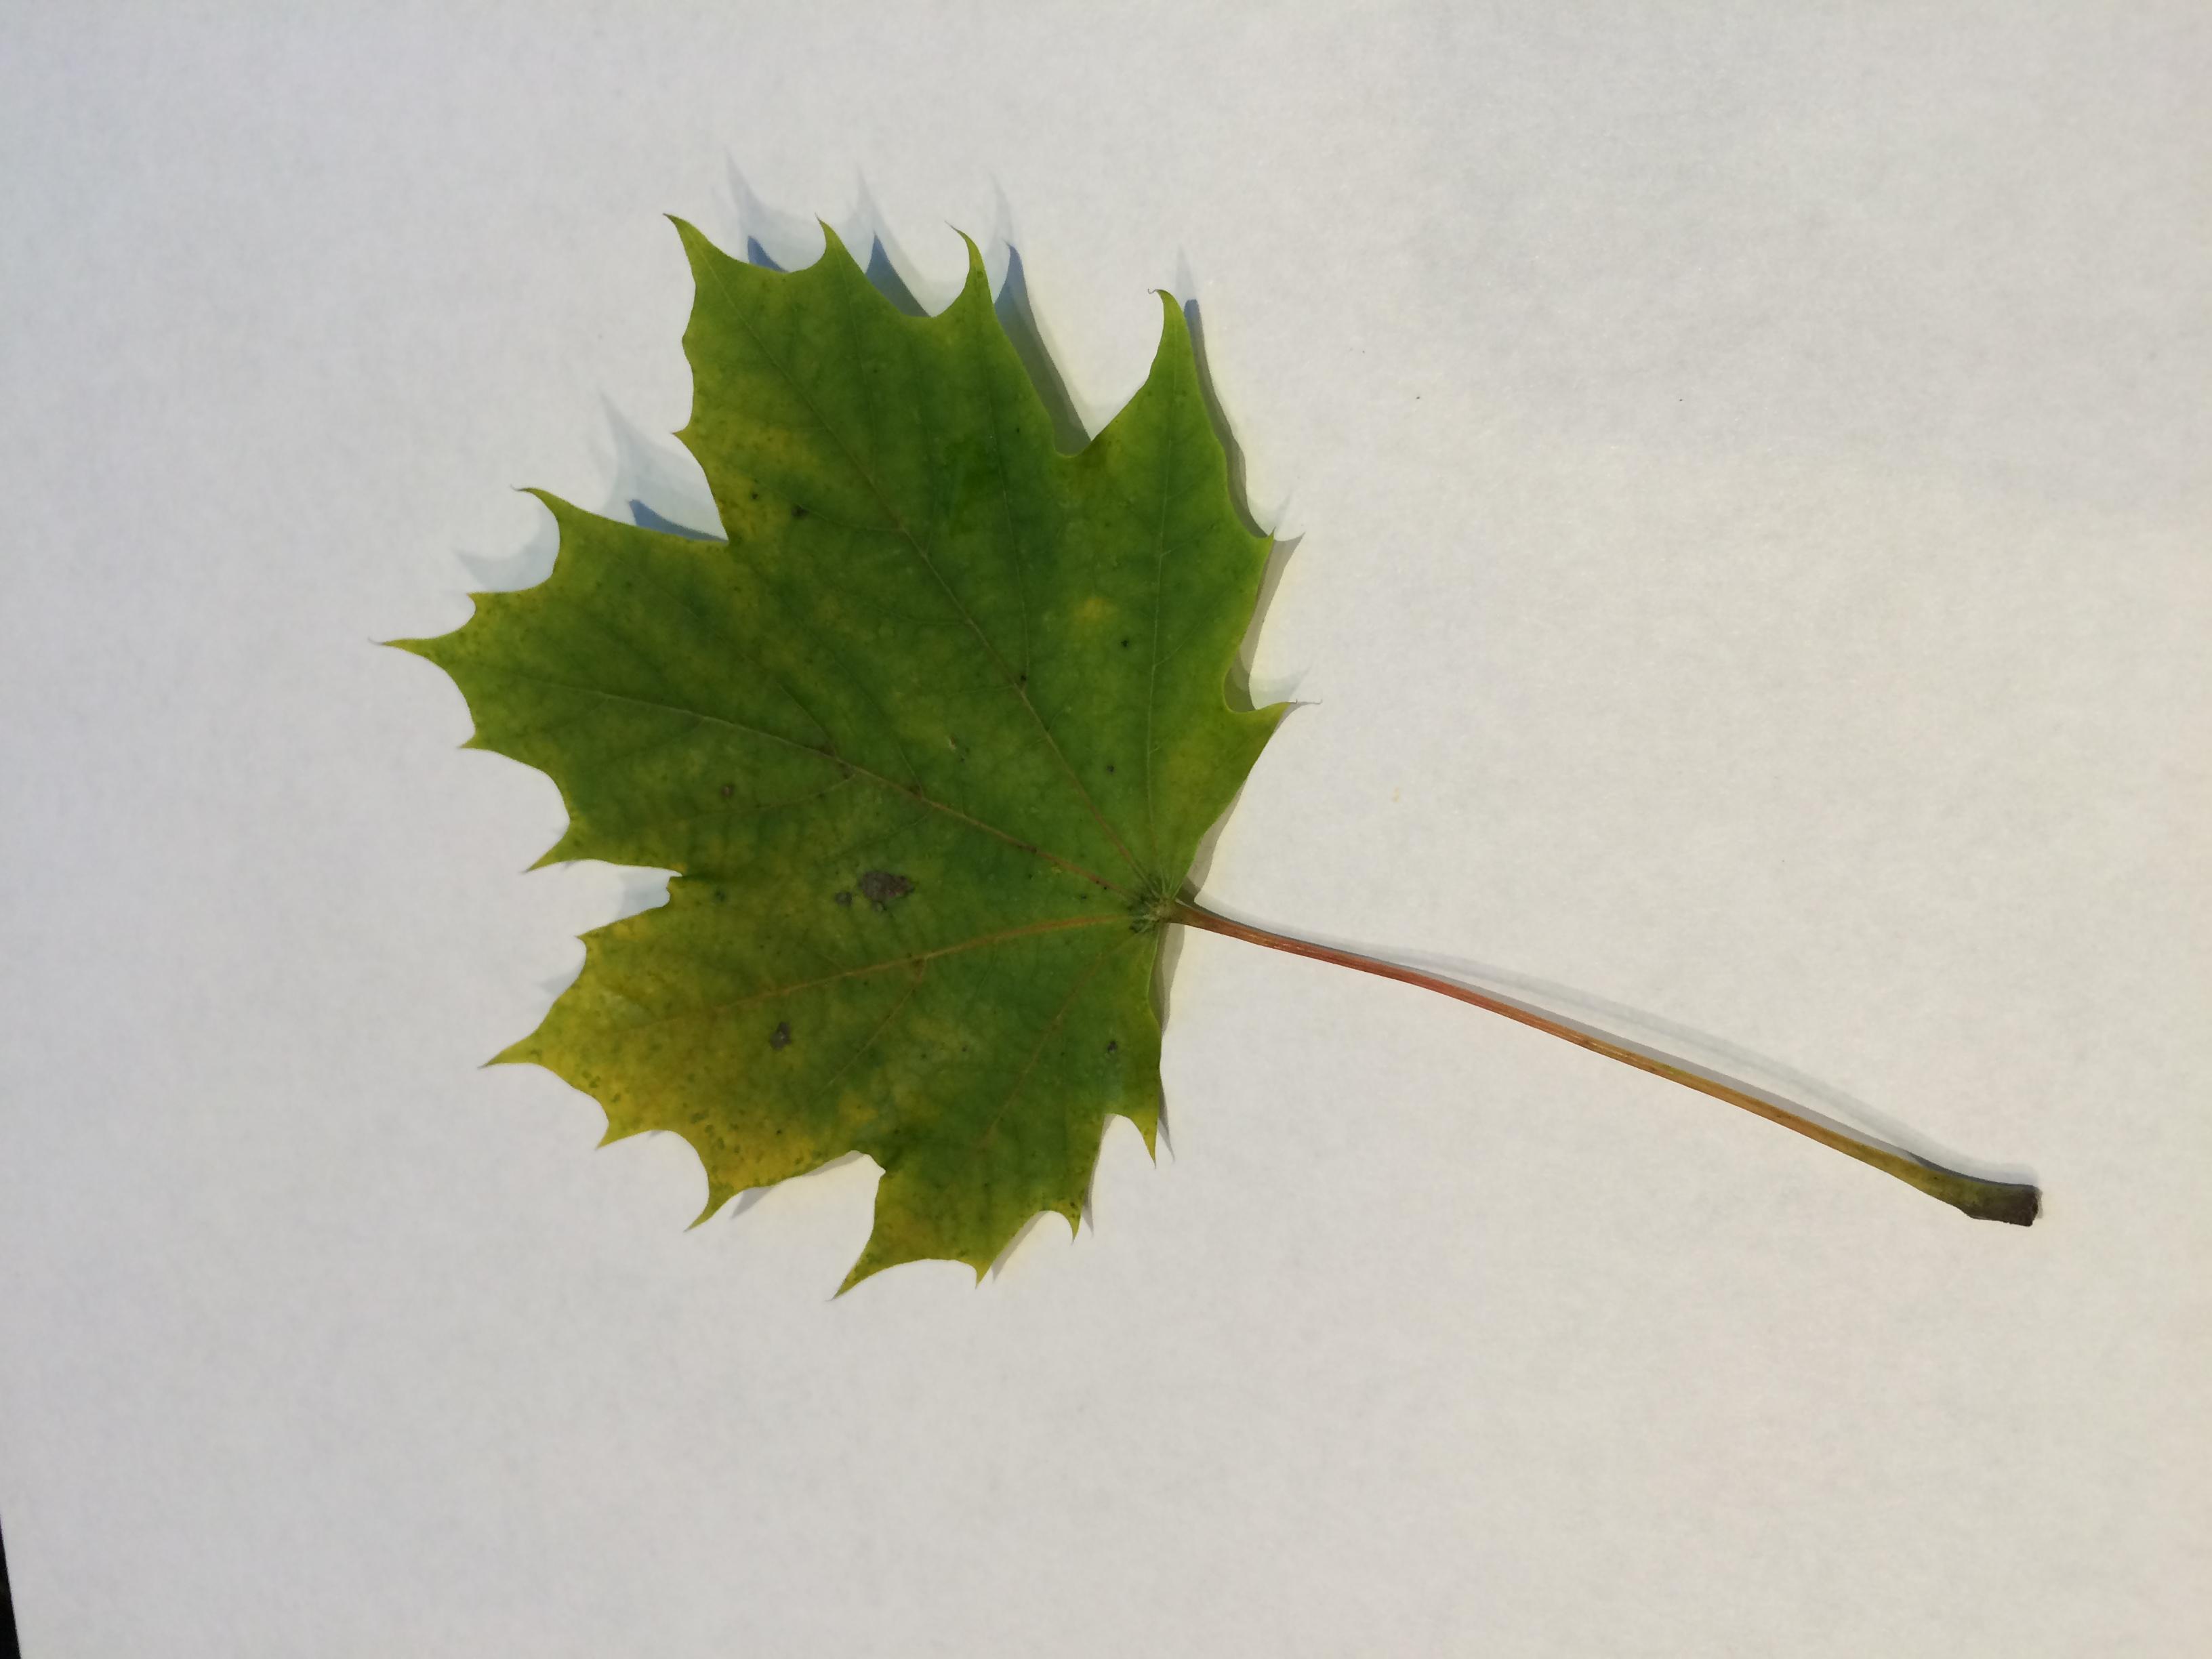 gwl/static/gwl/images/new-leaves/green-3.jpg